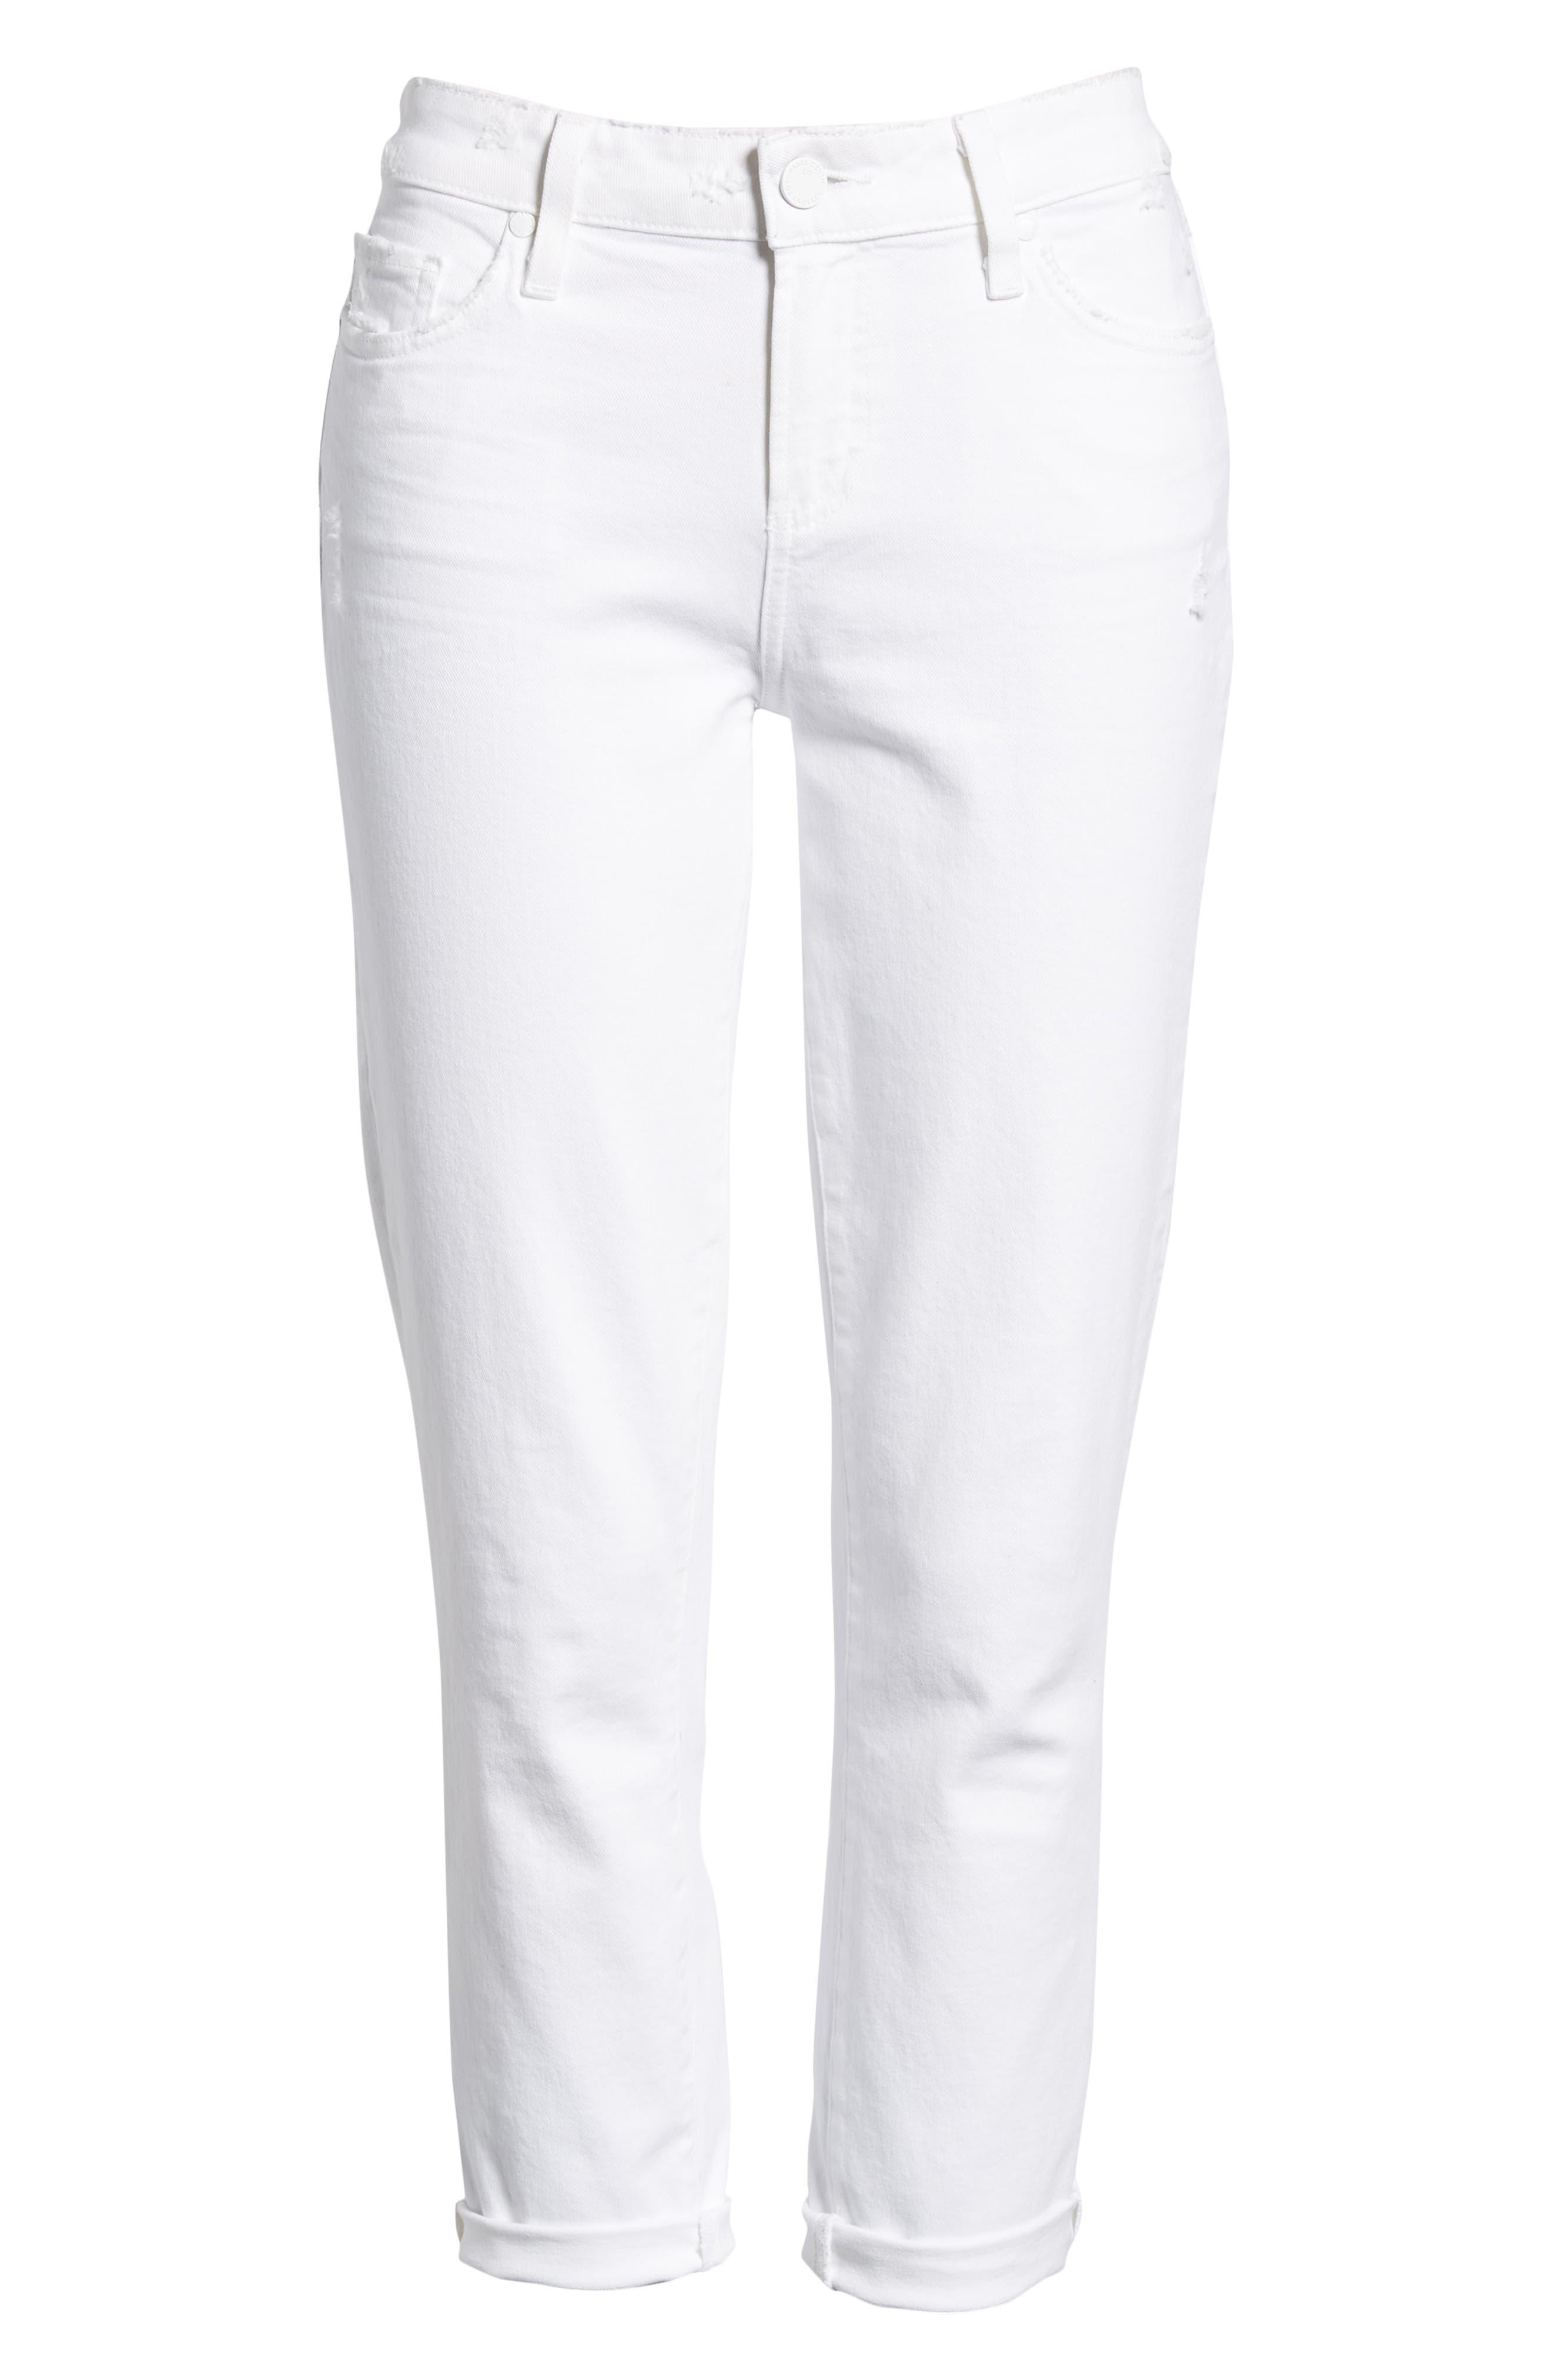 Skyline Raw Hem Crop Skinny Jeans,                             Alternate thumbnail 6, color,                             LIVED IN CRISP WHITE